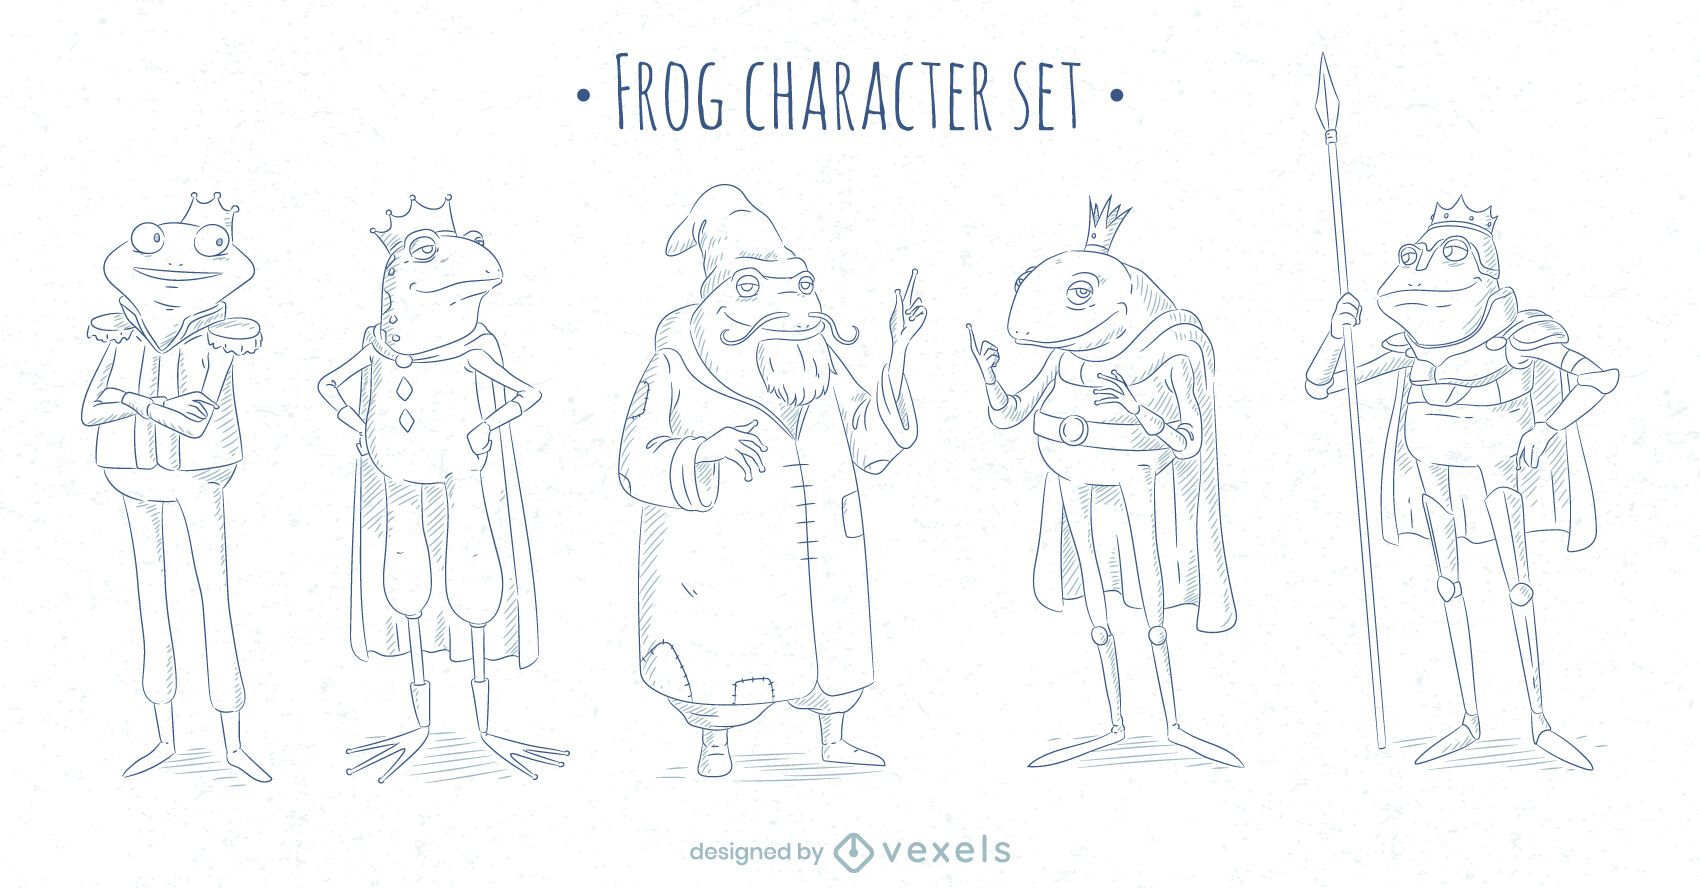 Fairytale frog character stroke set